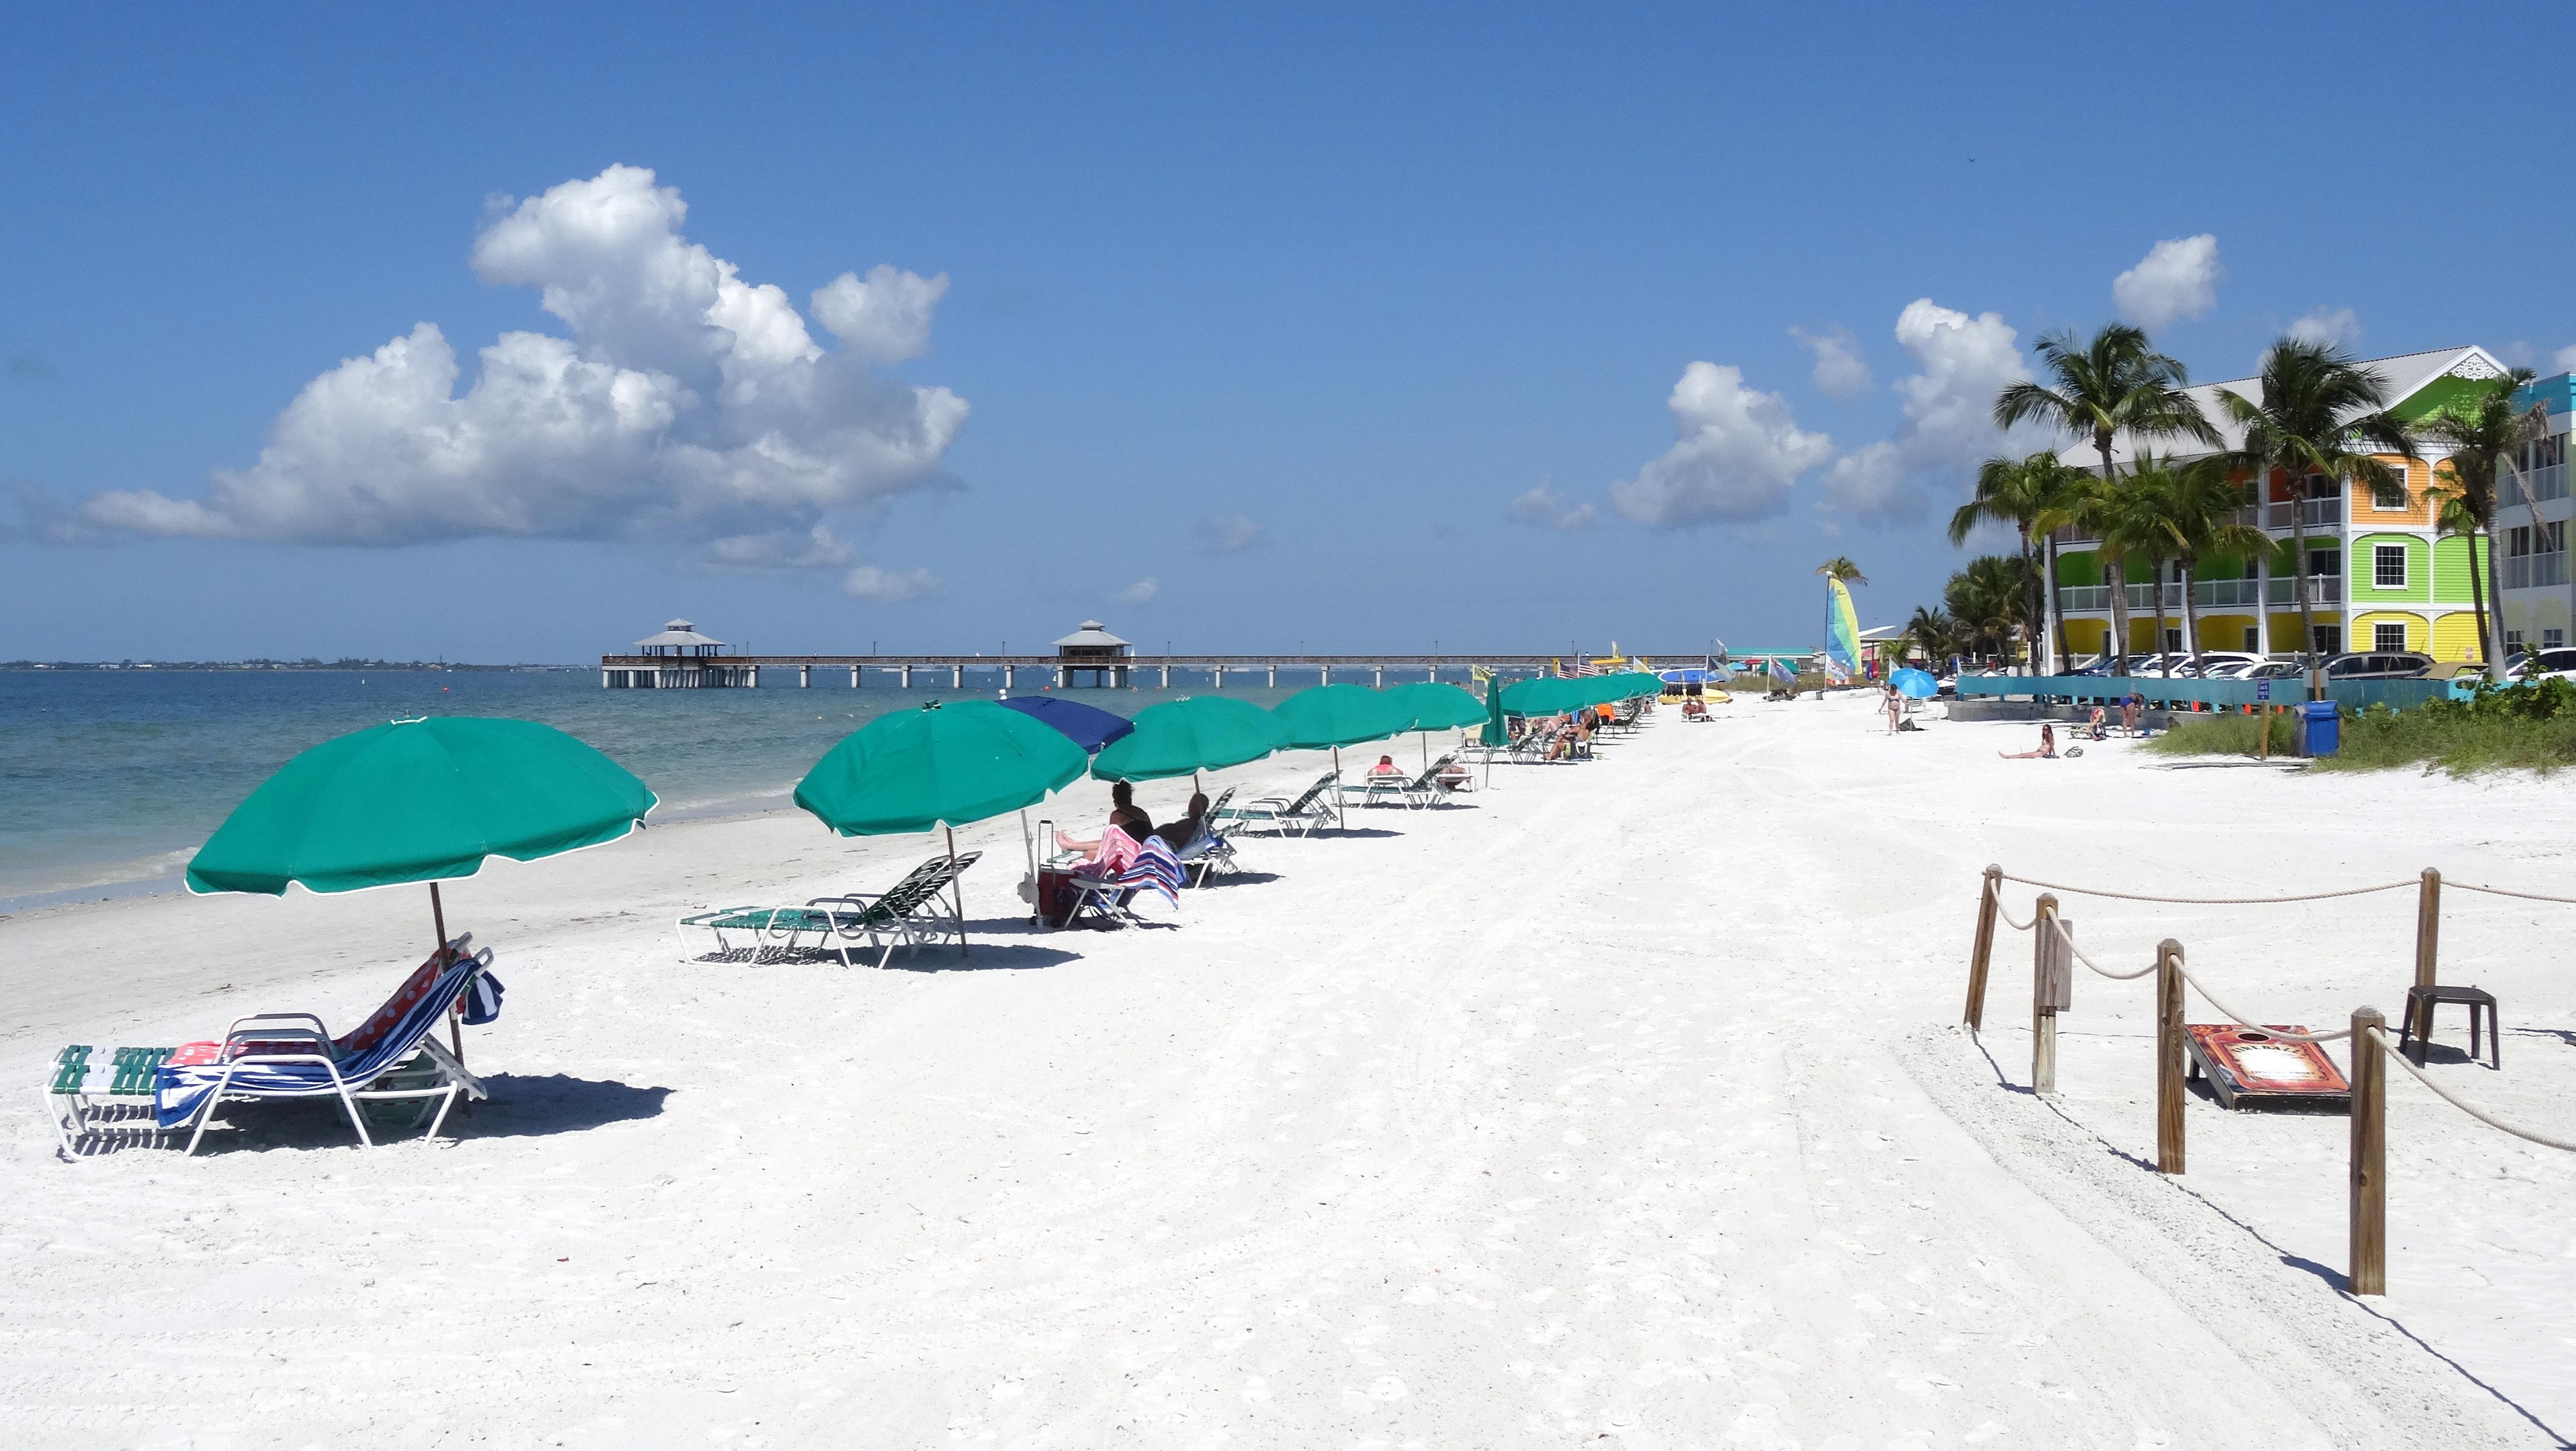 Beachdream Fort Myers Vacation Als San Carlos Bay Bunche Beach Preserve Florida Usa